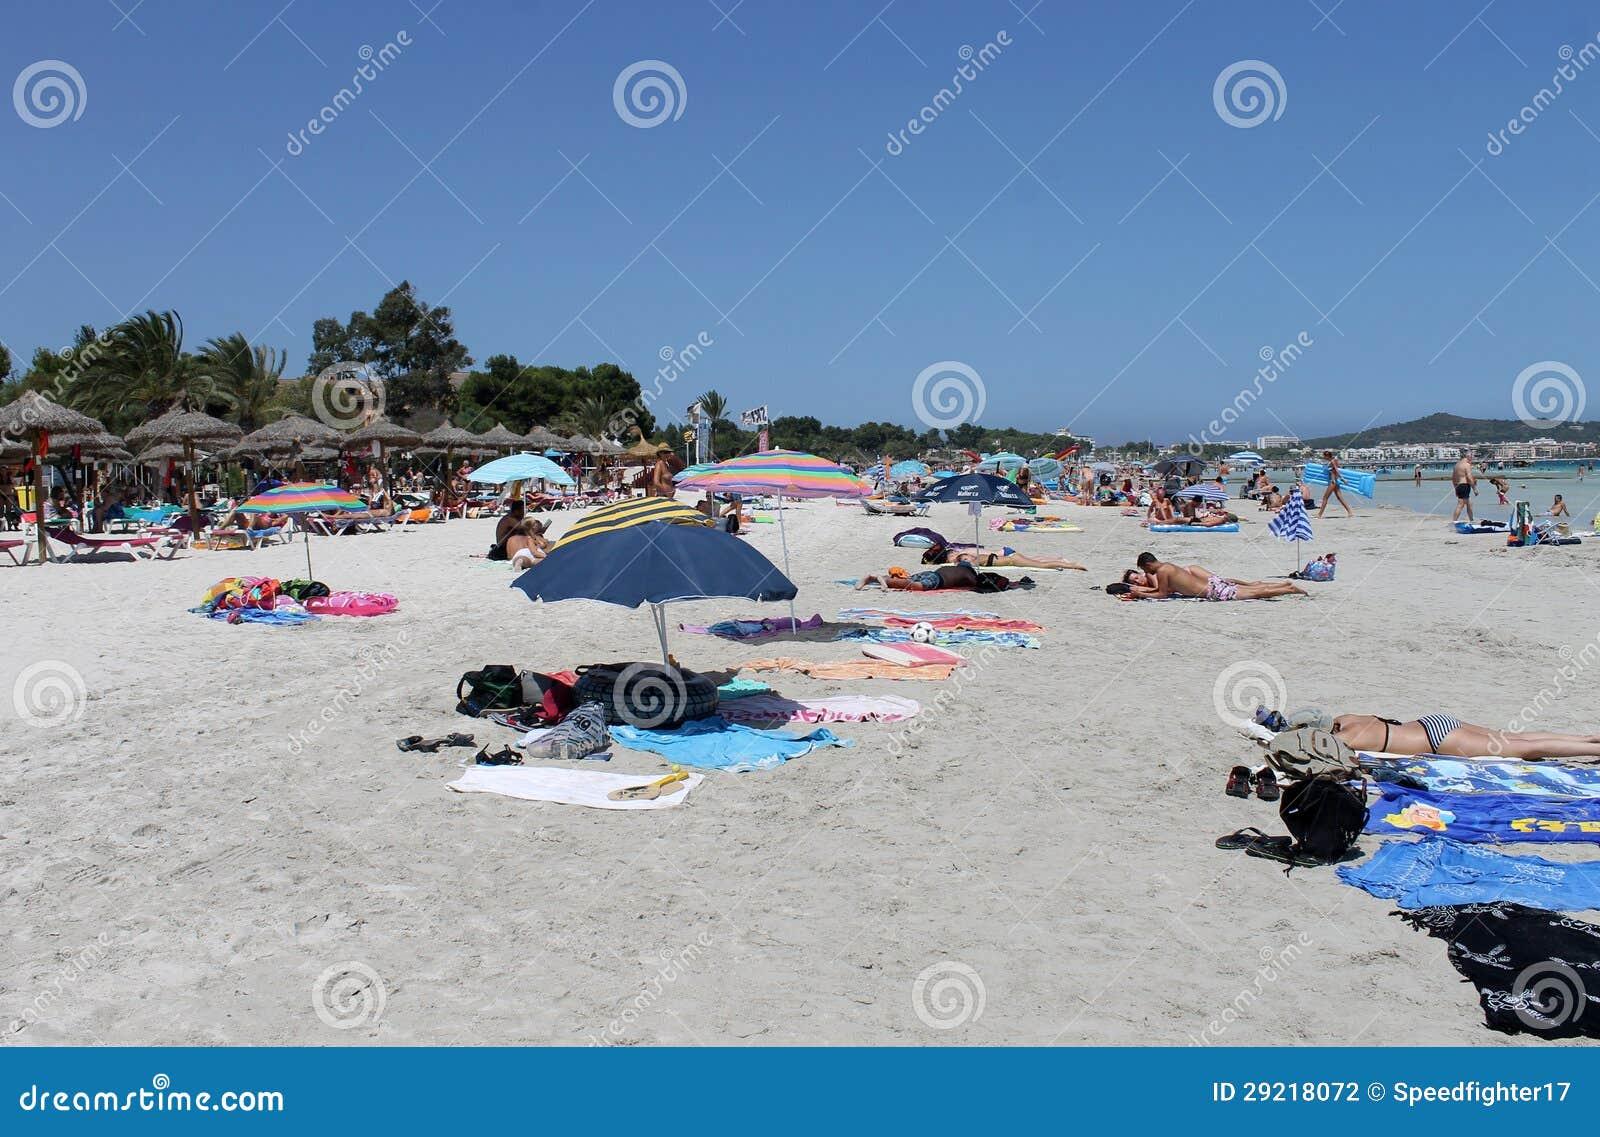 People Relaxing On Beach In Majorca